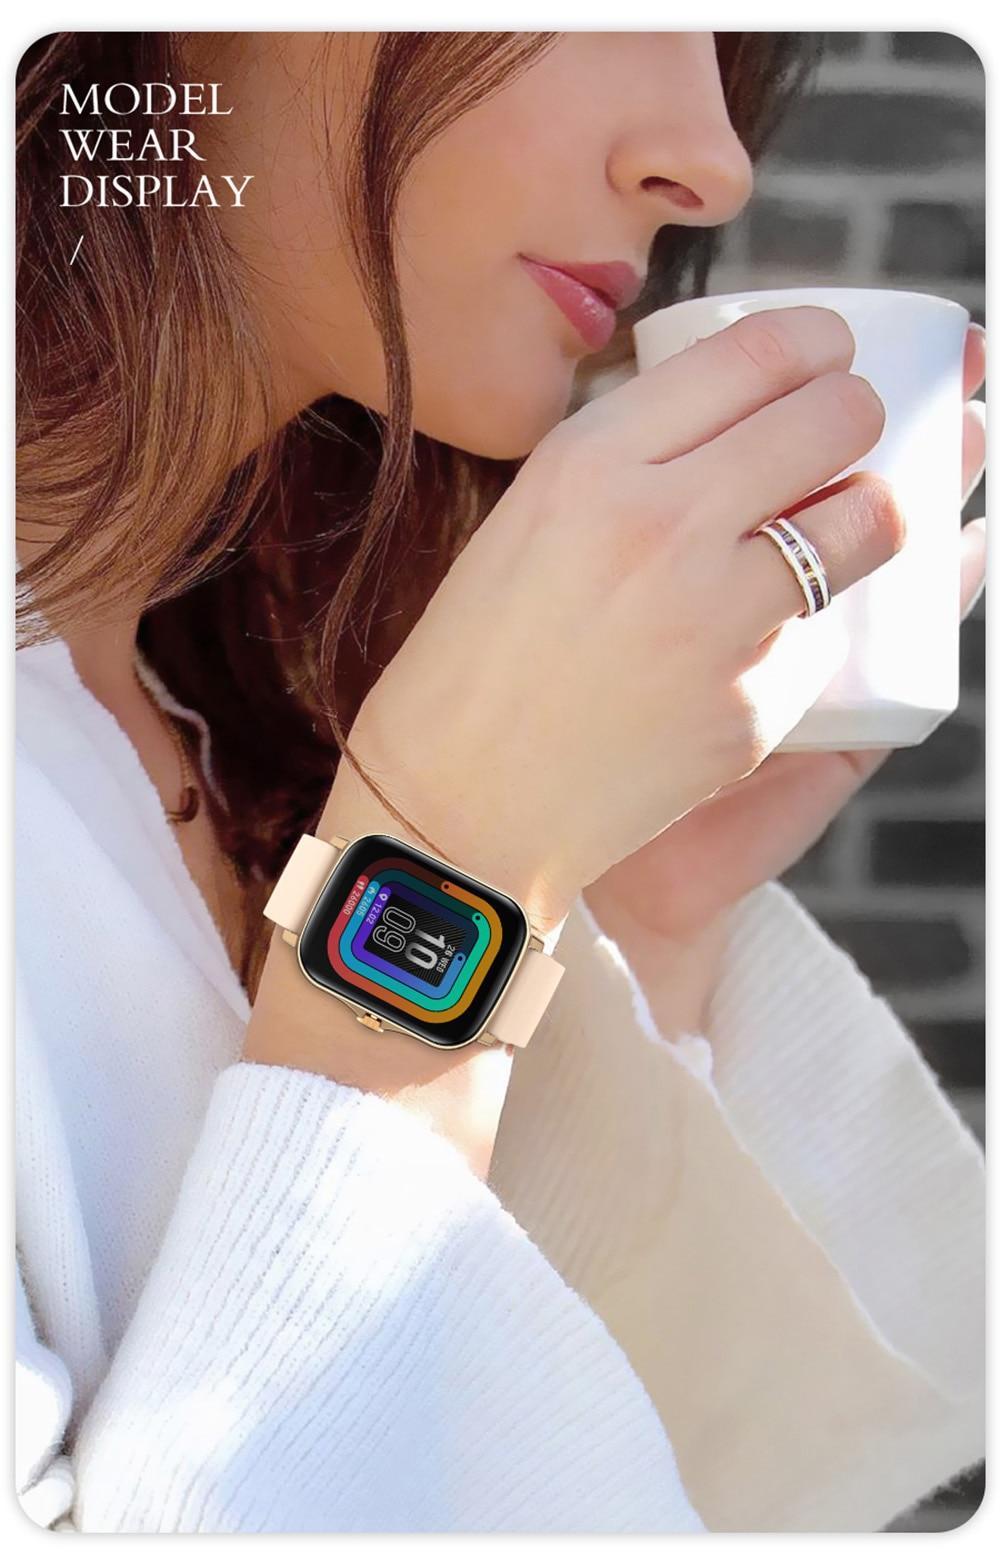 H66da98cecee442f79dc4bfcc29ae558b8 COLMI P8 Plus 1.69 inch 2021 Smart Watch Men Full Touch Fitness Tracker IP67 waterproof Women GTS 2 Smartwatch for Xiaomi phone